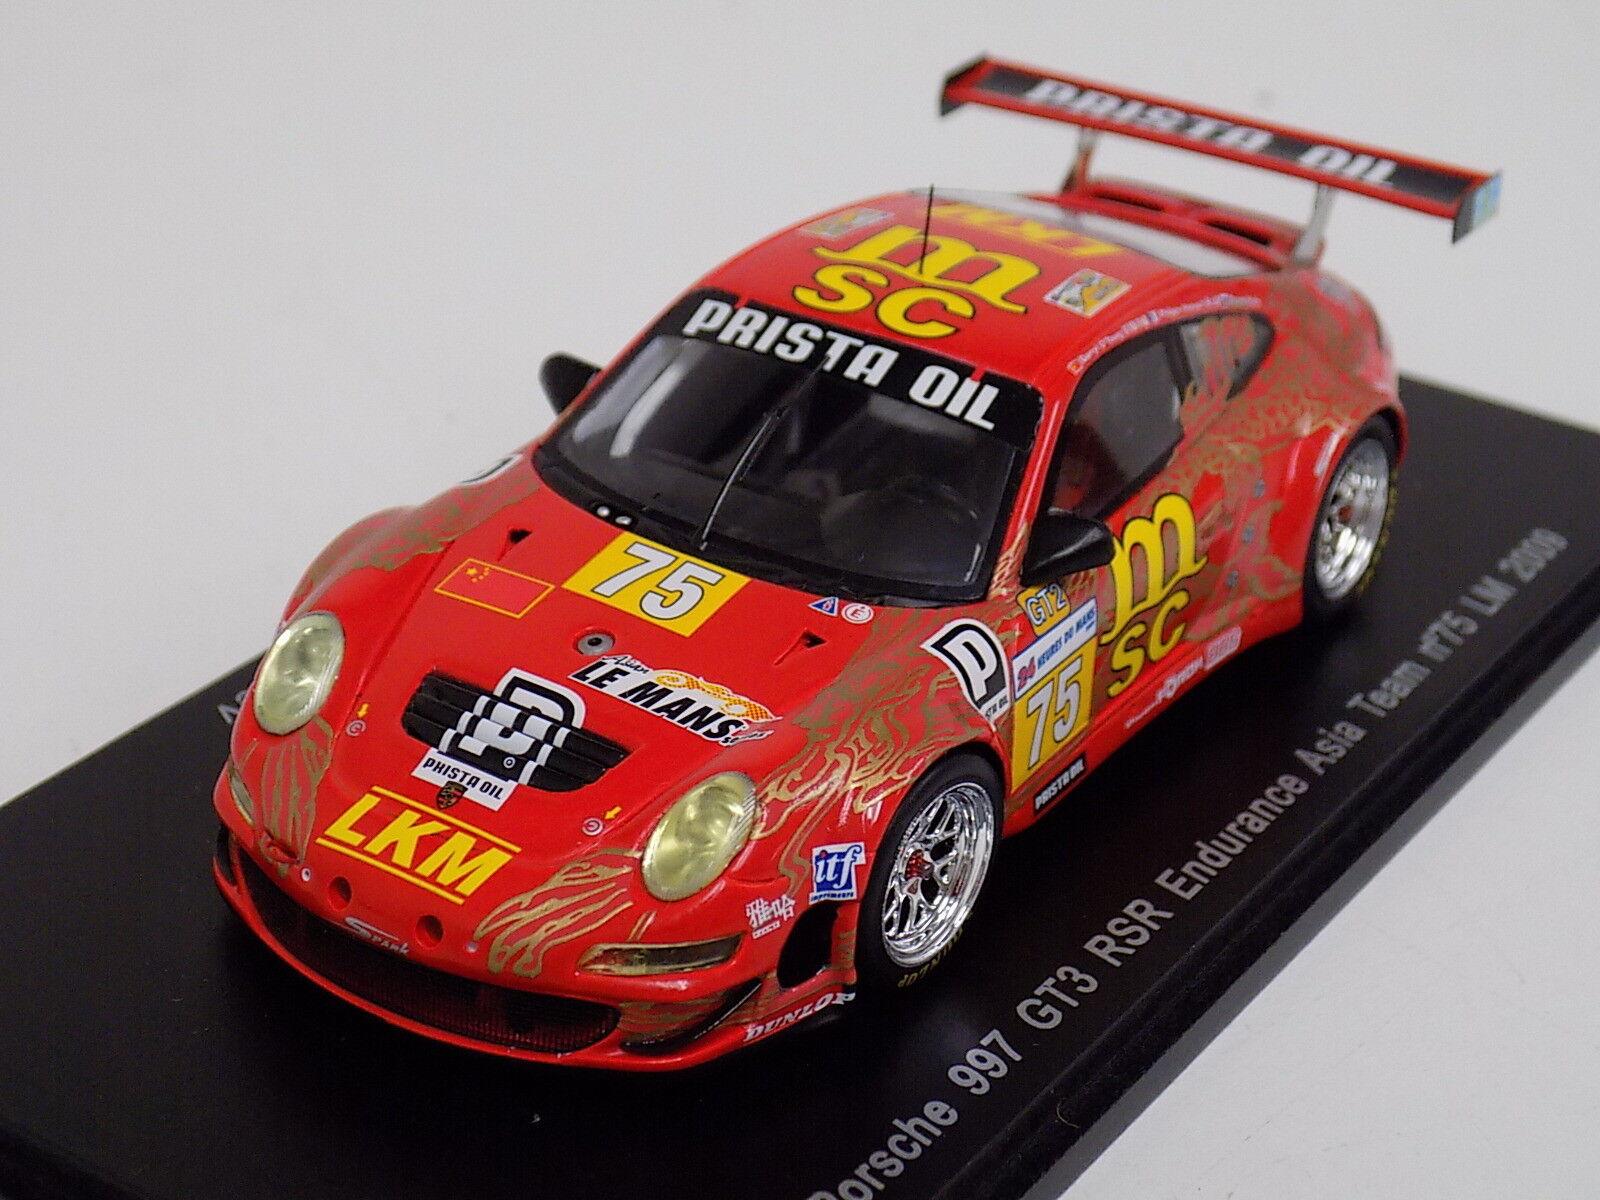 ofrecemos varias marcas famosas 1 43 Spark Porsche 911  997  GT3 GT3 GT3 RSR coche  75 2009 24 horas de LeMans S1953  ventas en línea de venta